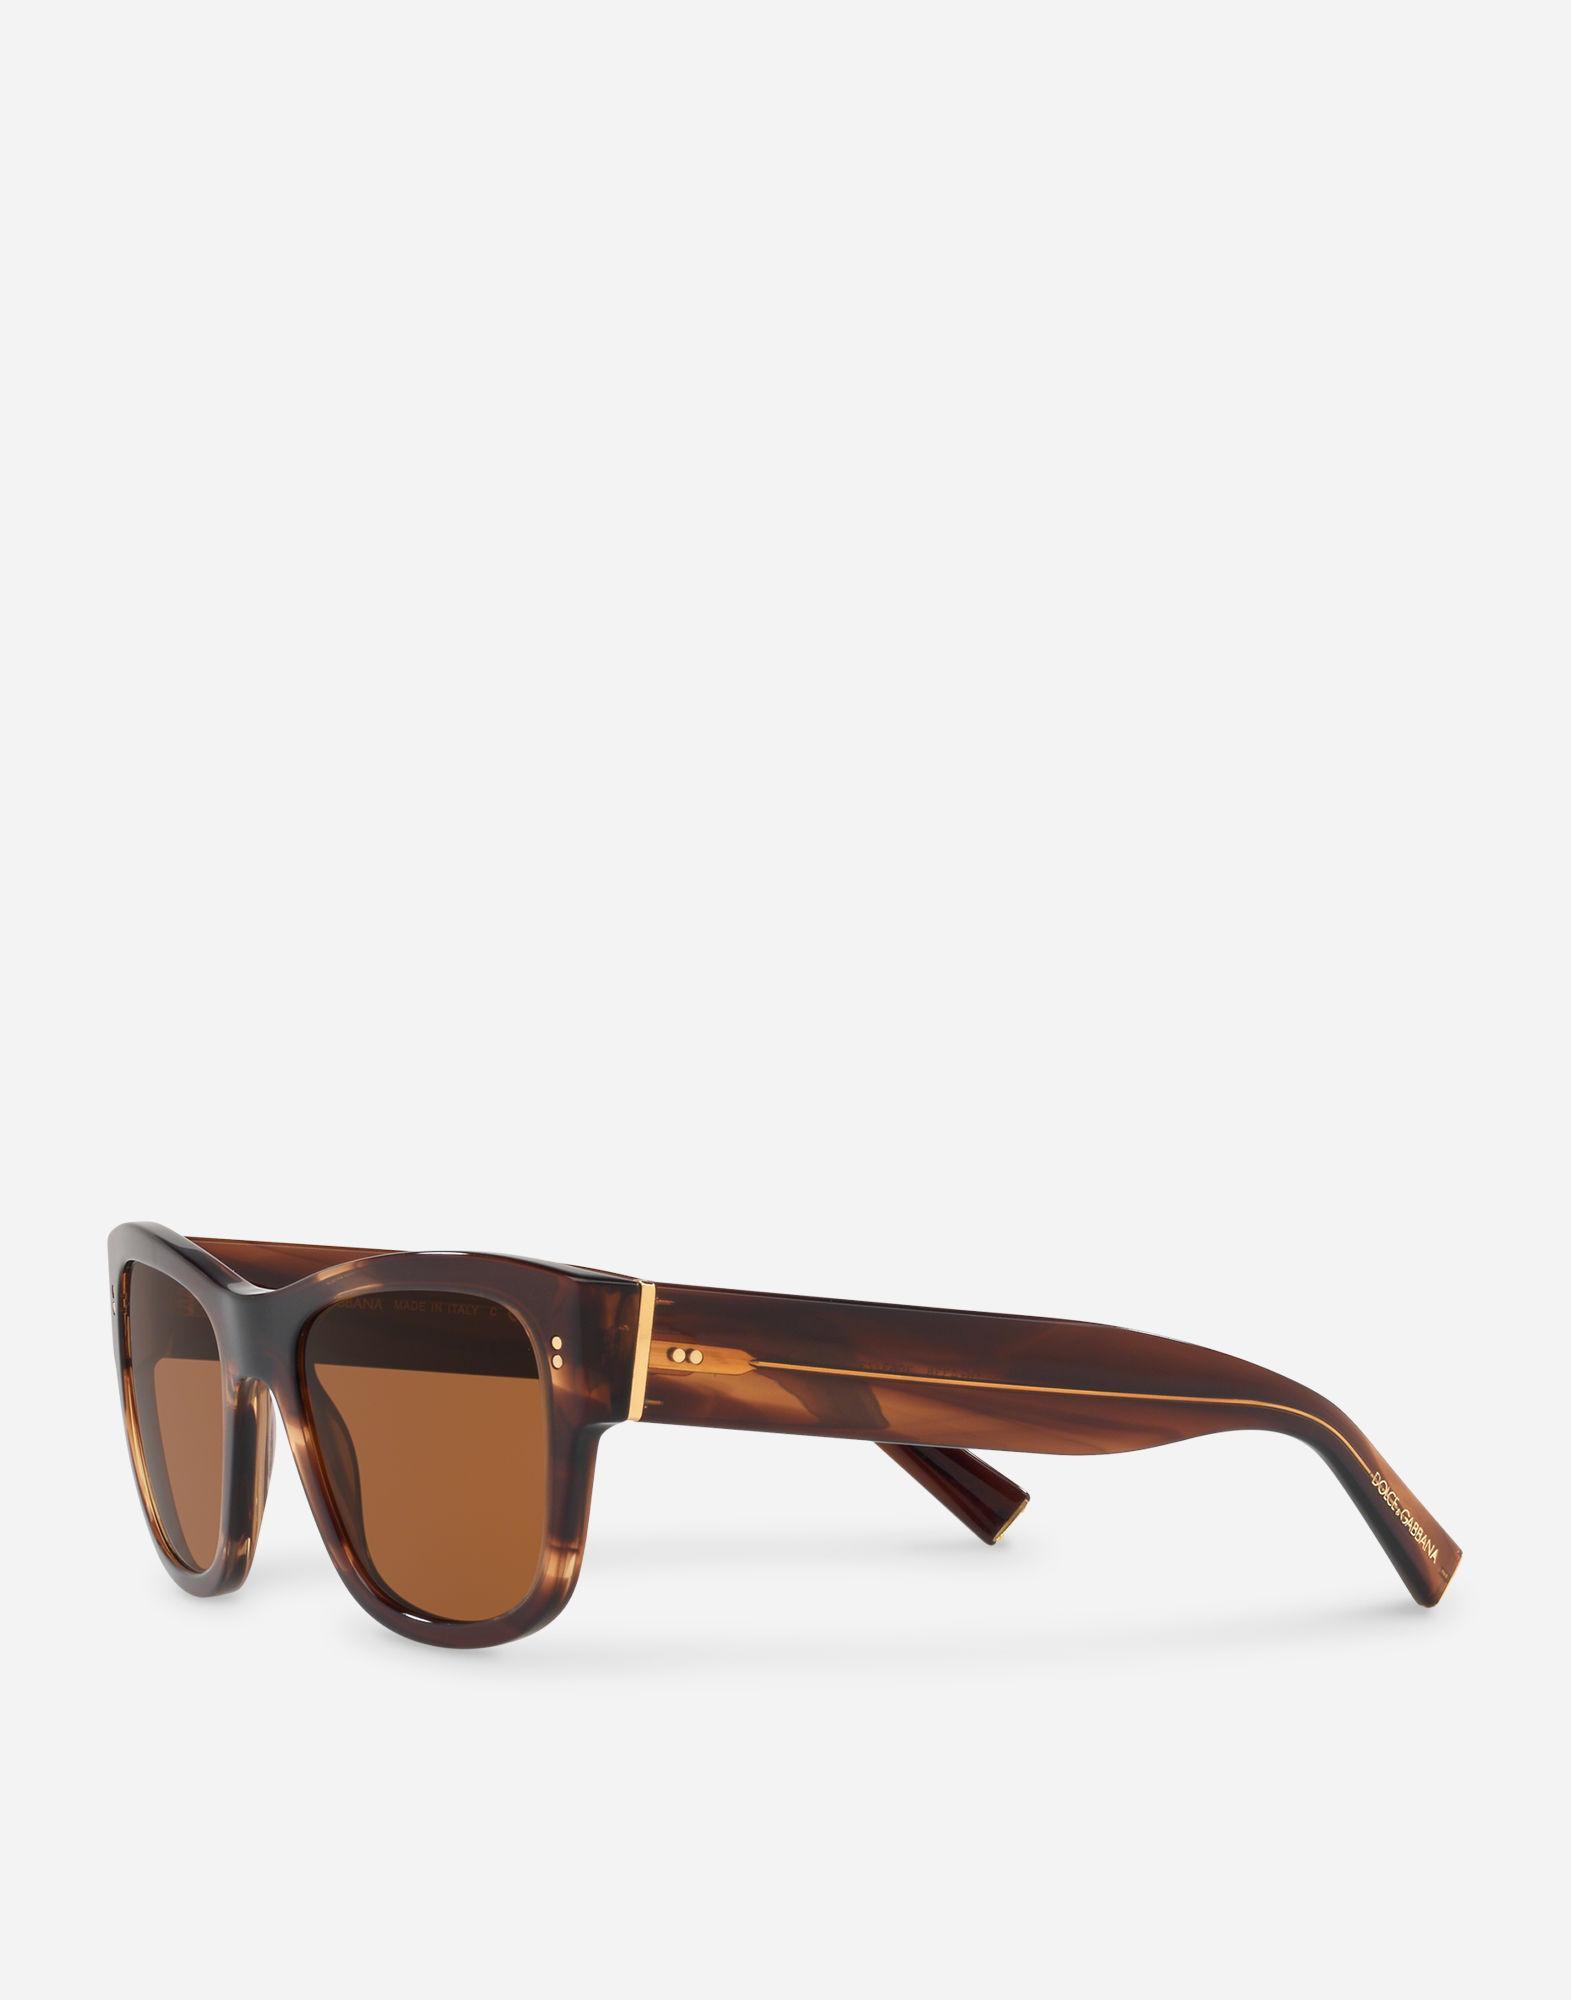 3df2aefb052 Lyst - Dolce   Gabbana Domenico Sunglasses in Brown for Men